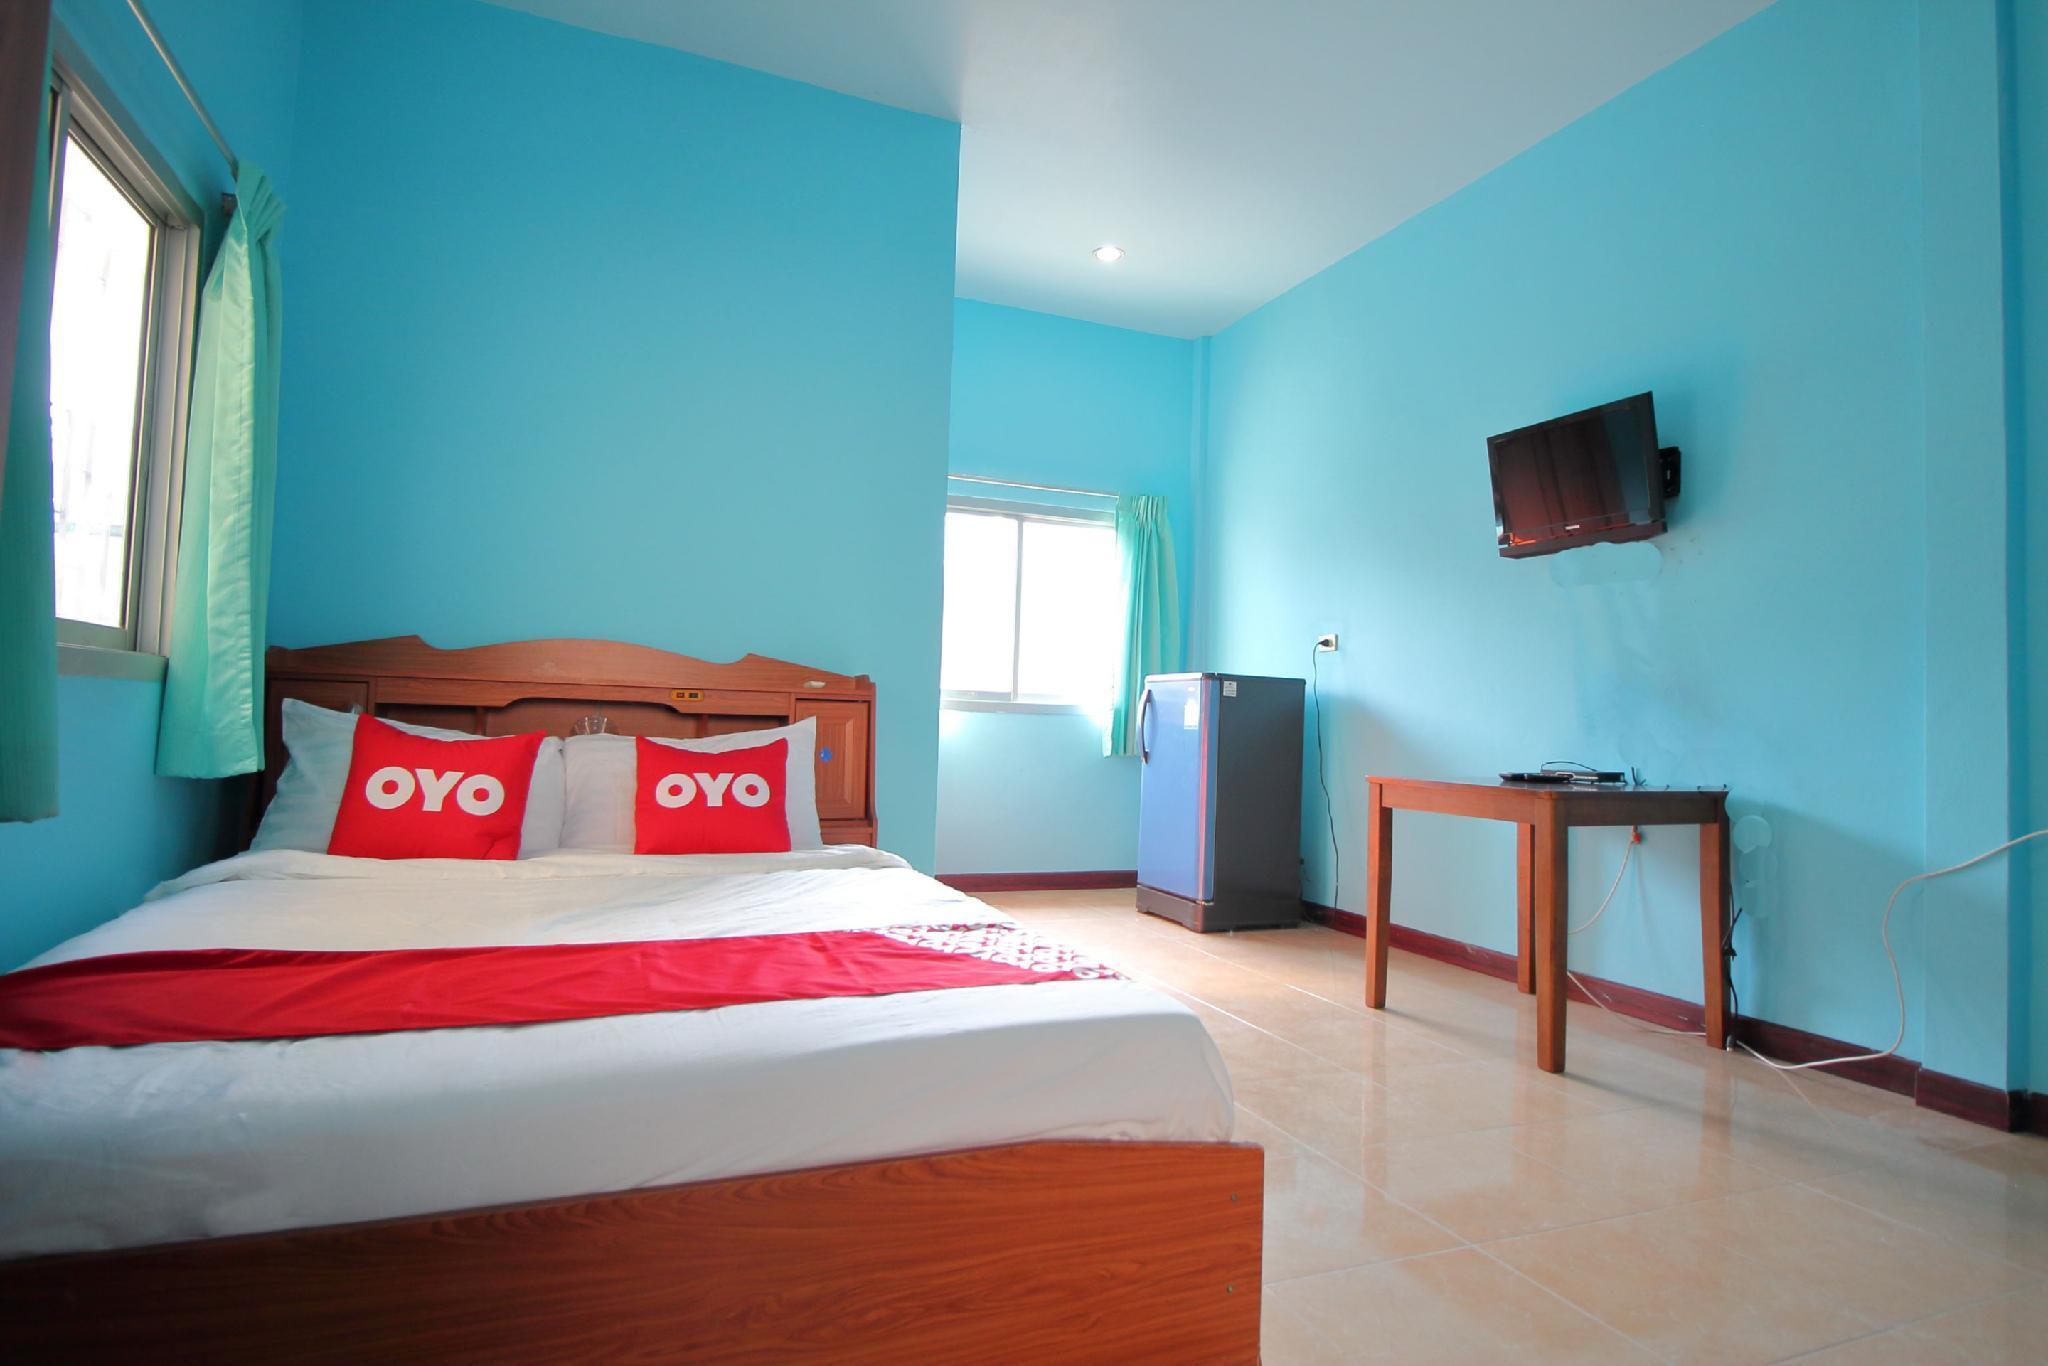 OYO 496 Chok Phikul Thong Resort